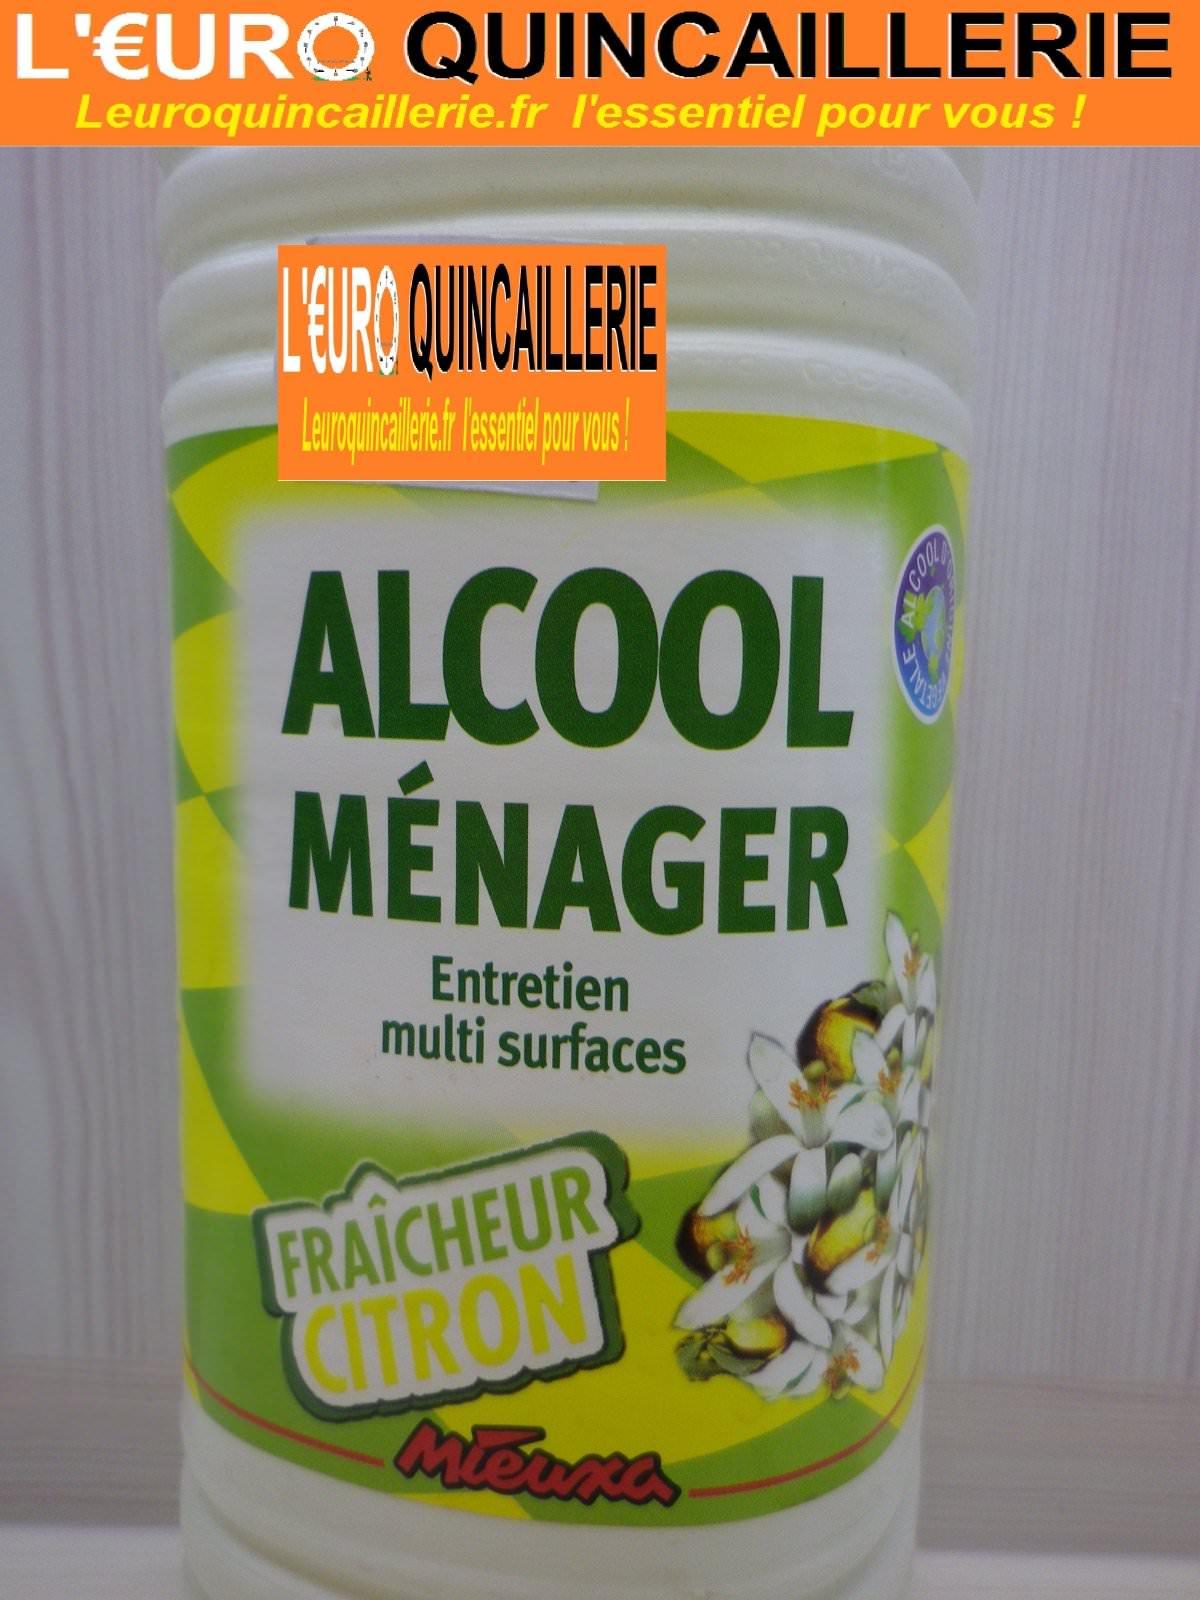 alcool m nager fraicheur citron 1 litre drogueries alcool m nager. Black Bedroom Furniture Sets. Home Design Ideas